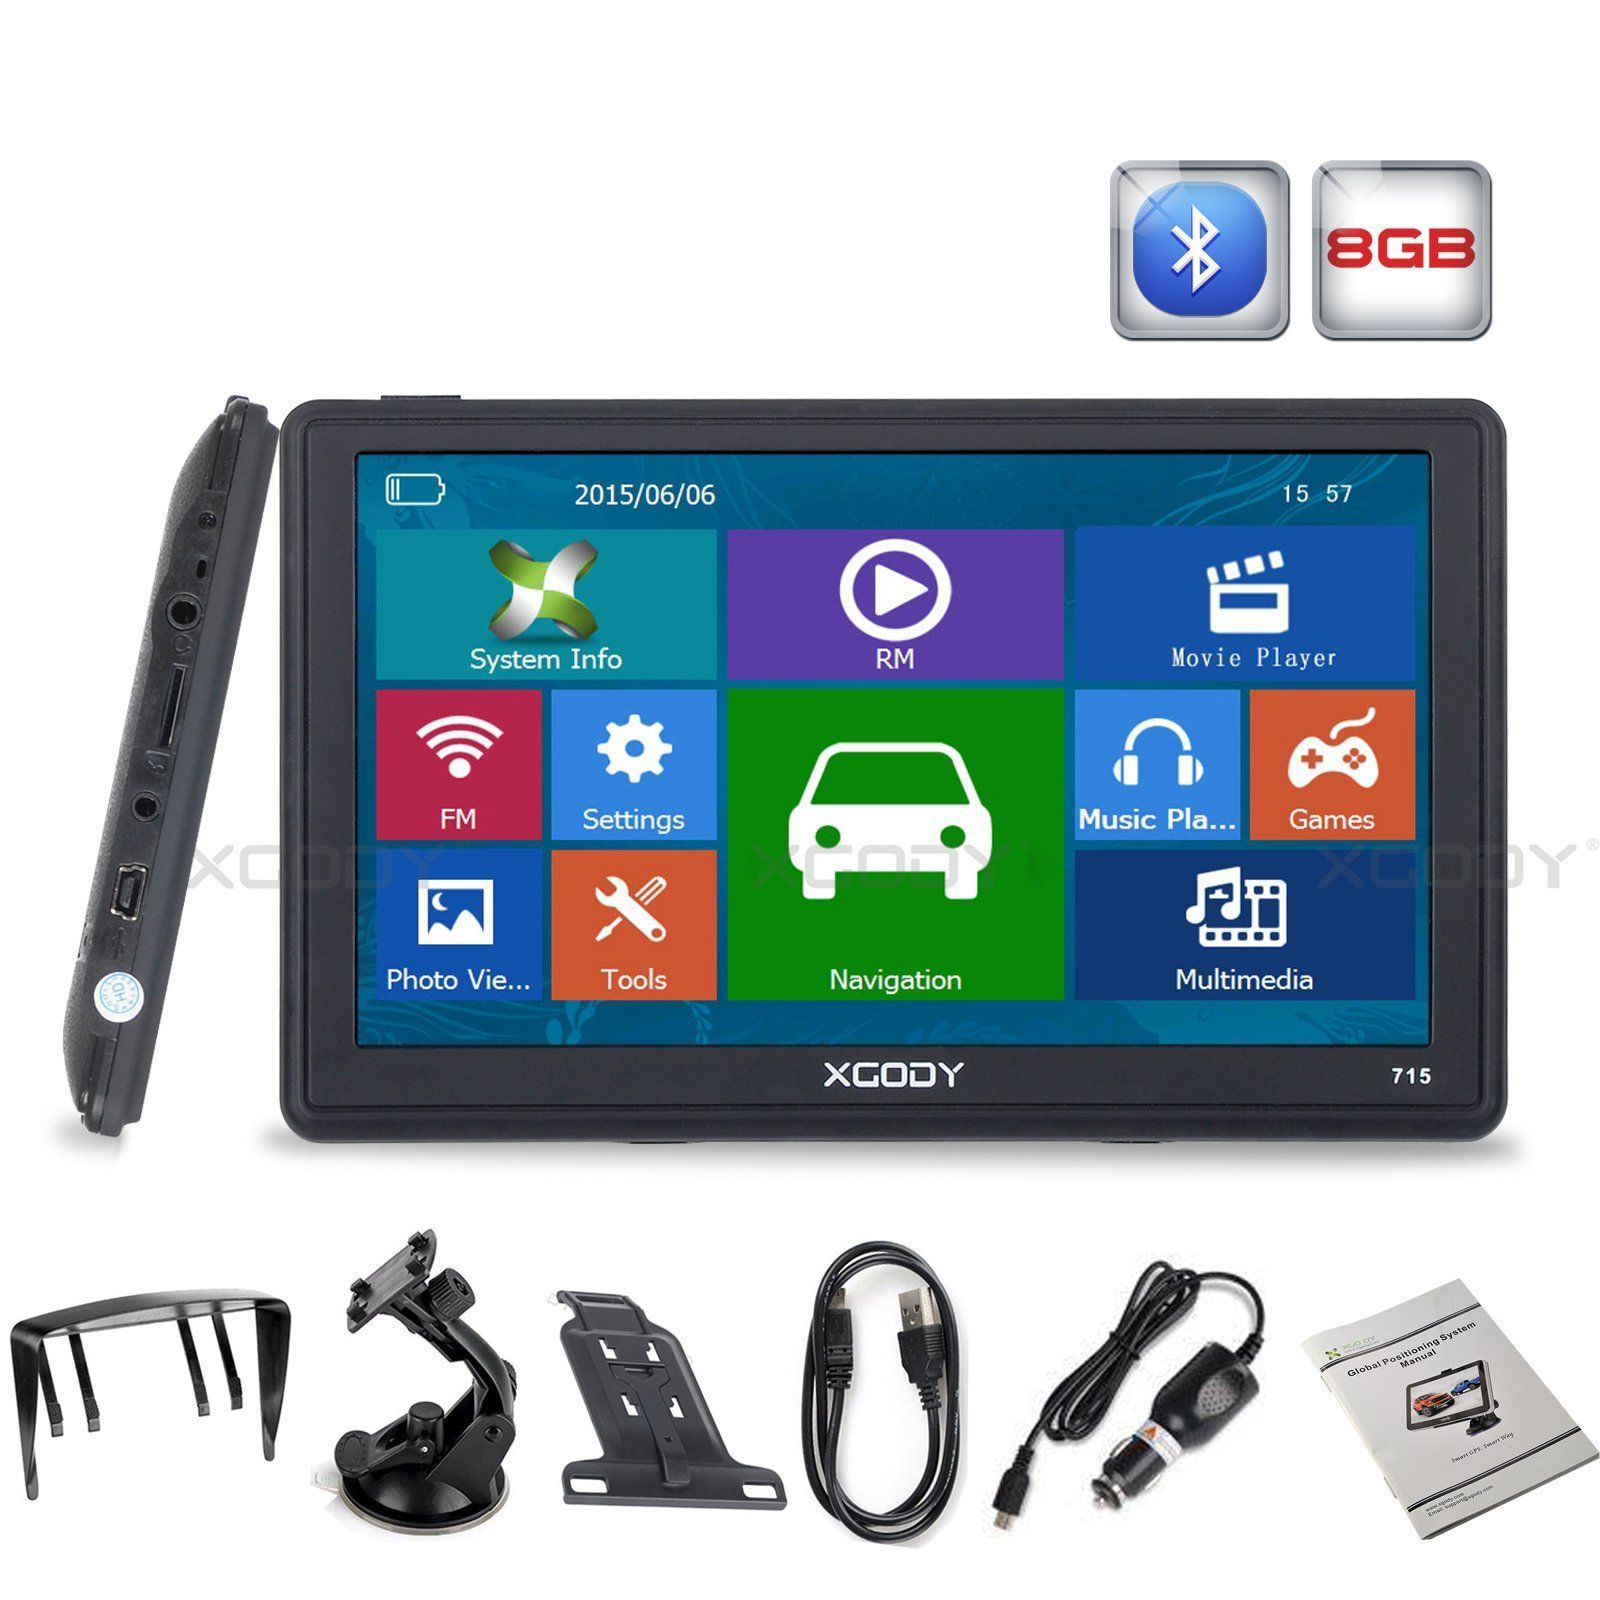 XGODY 7 8GB Truck Car GPS Navigation FM Lorry Sat Nav Navigator Bluetooth AV-IN